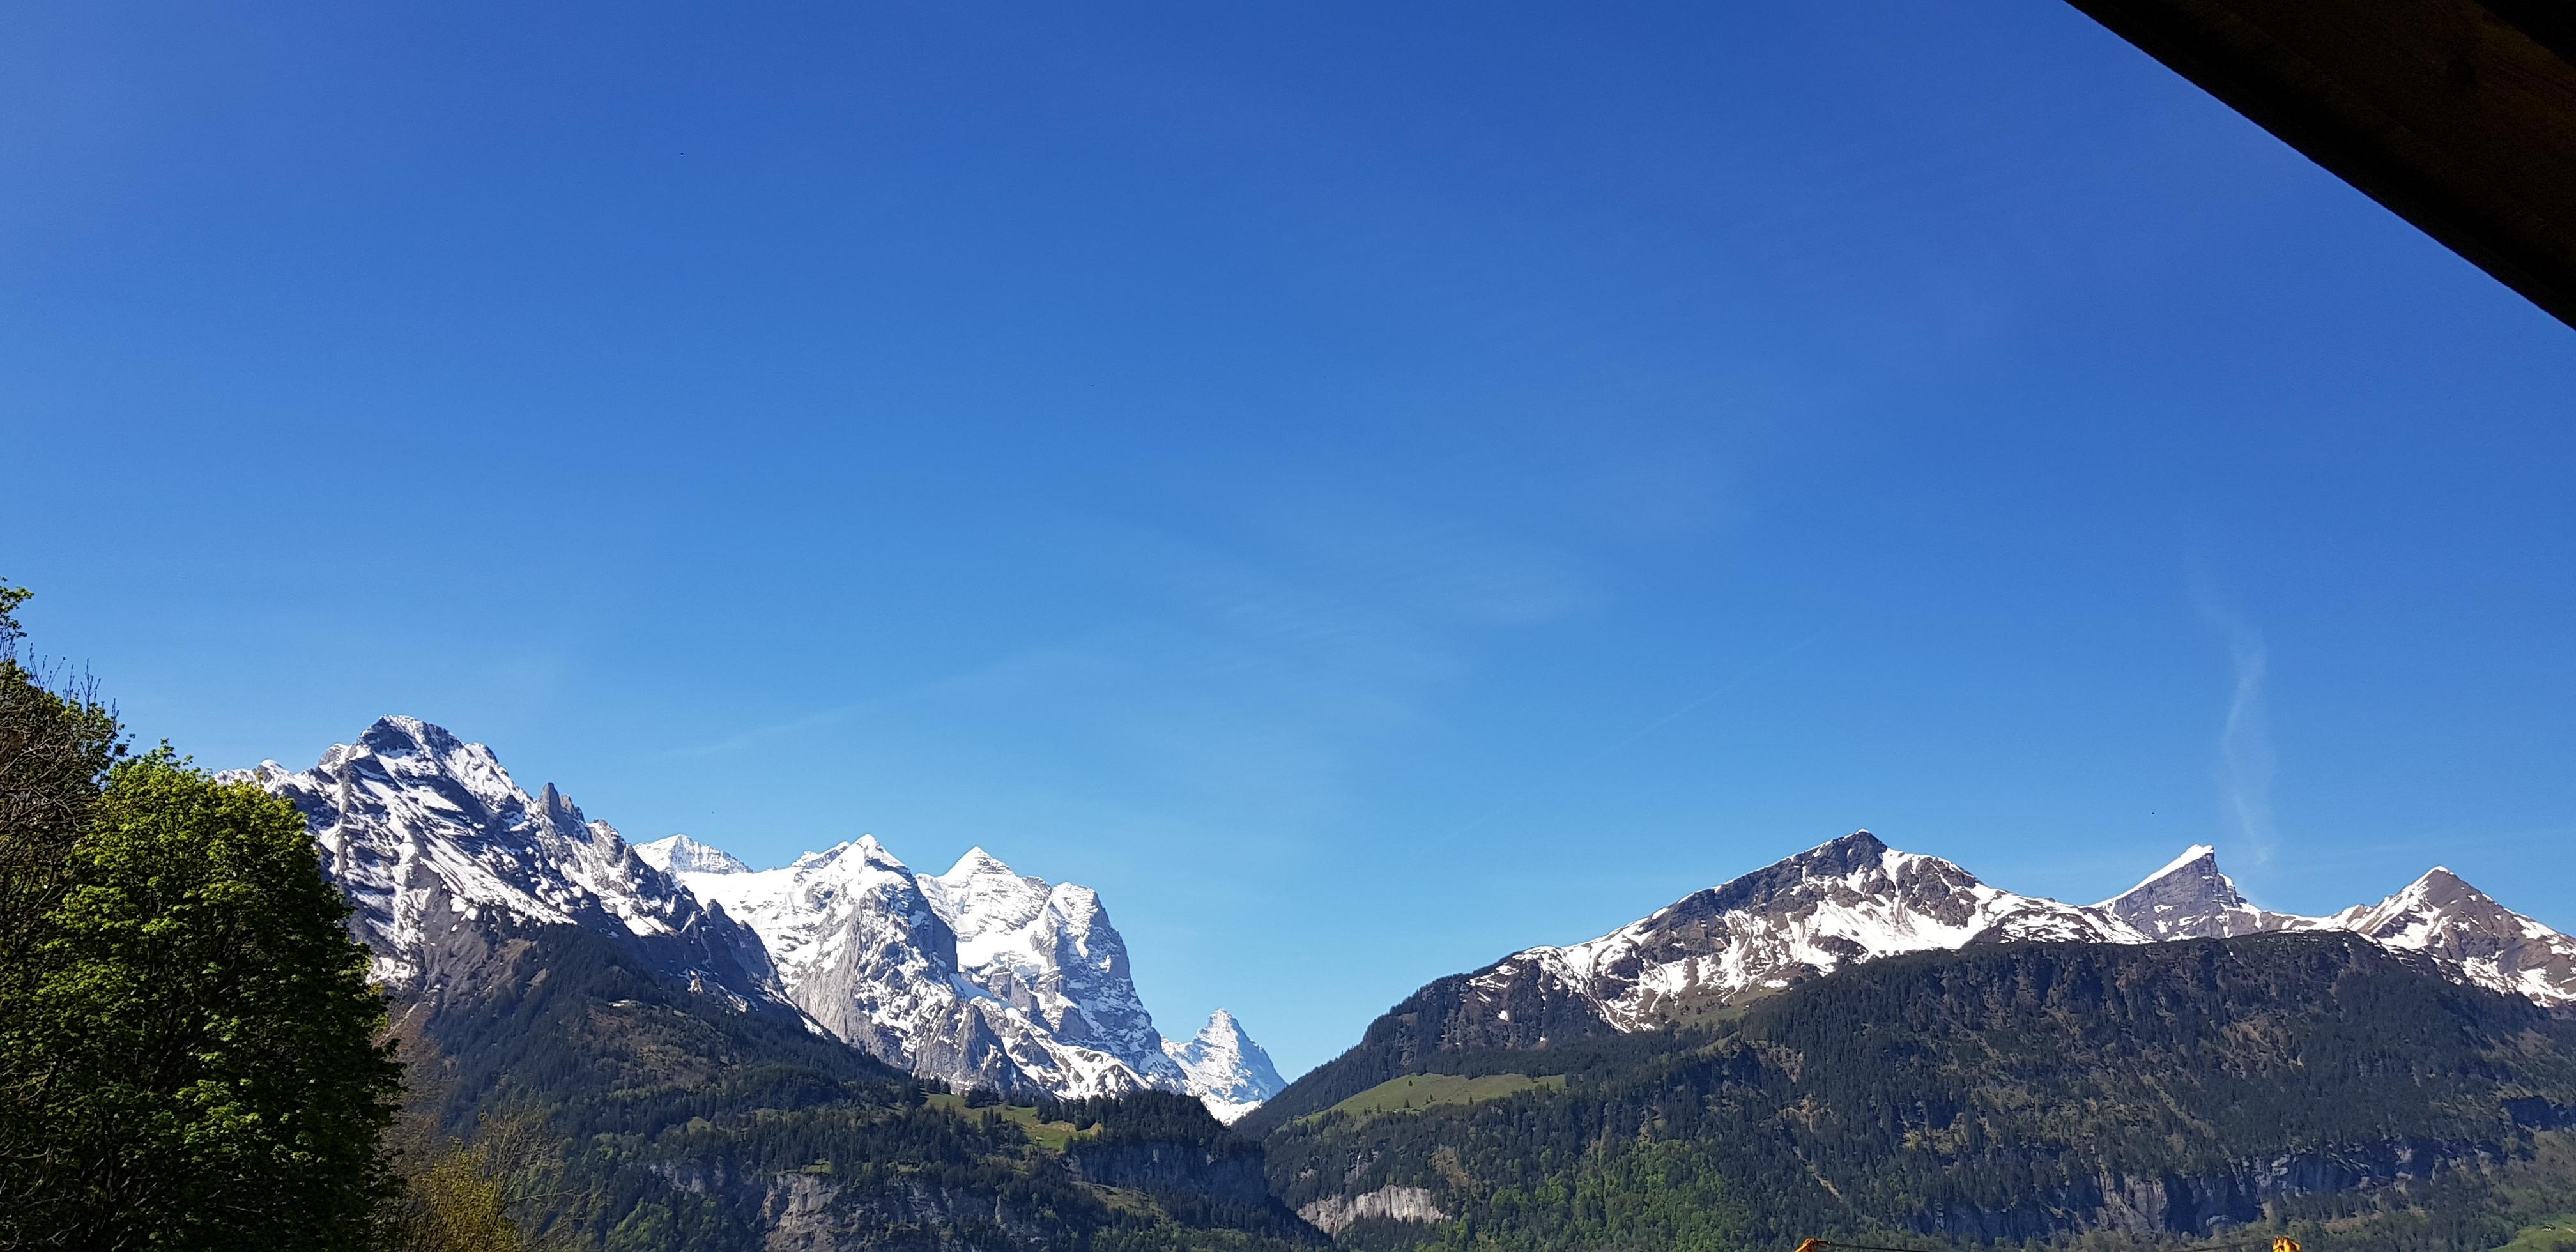 Ferienwohnung Kastor 5-Bettwohnung (2455799), Hasliberg Reuti, Meiringen - Hasliberg, Berner Oberland, Schweiz, Bild 17